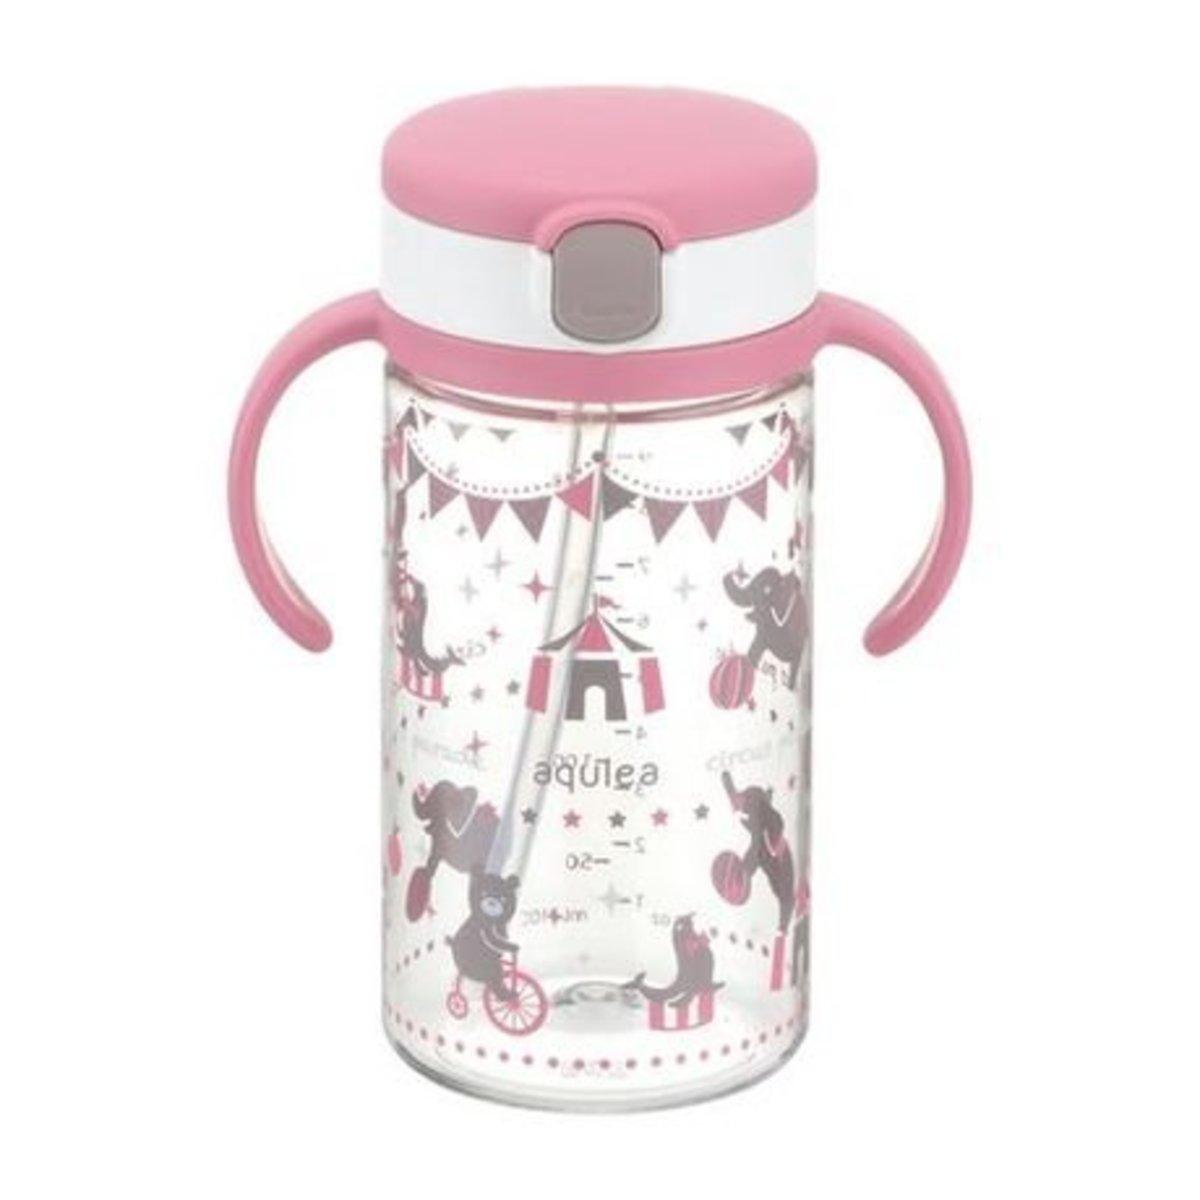 Richell | Richell 馬戲團圖案嬰兒吸管水杯320ml (粉紅色) | 香港電視 HKTVmall 網上購物